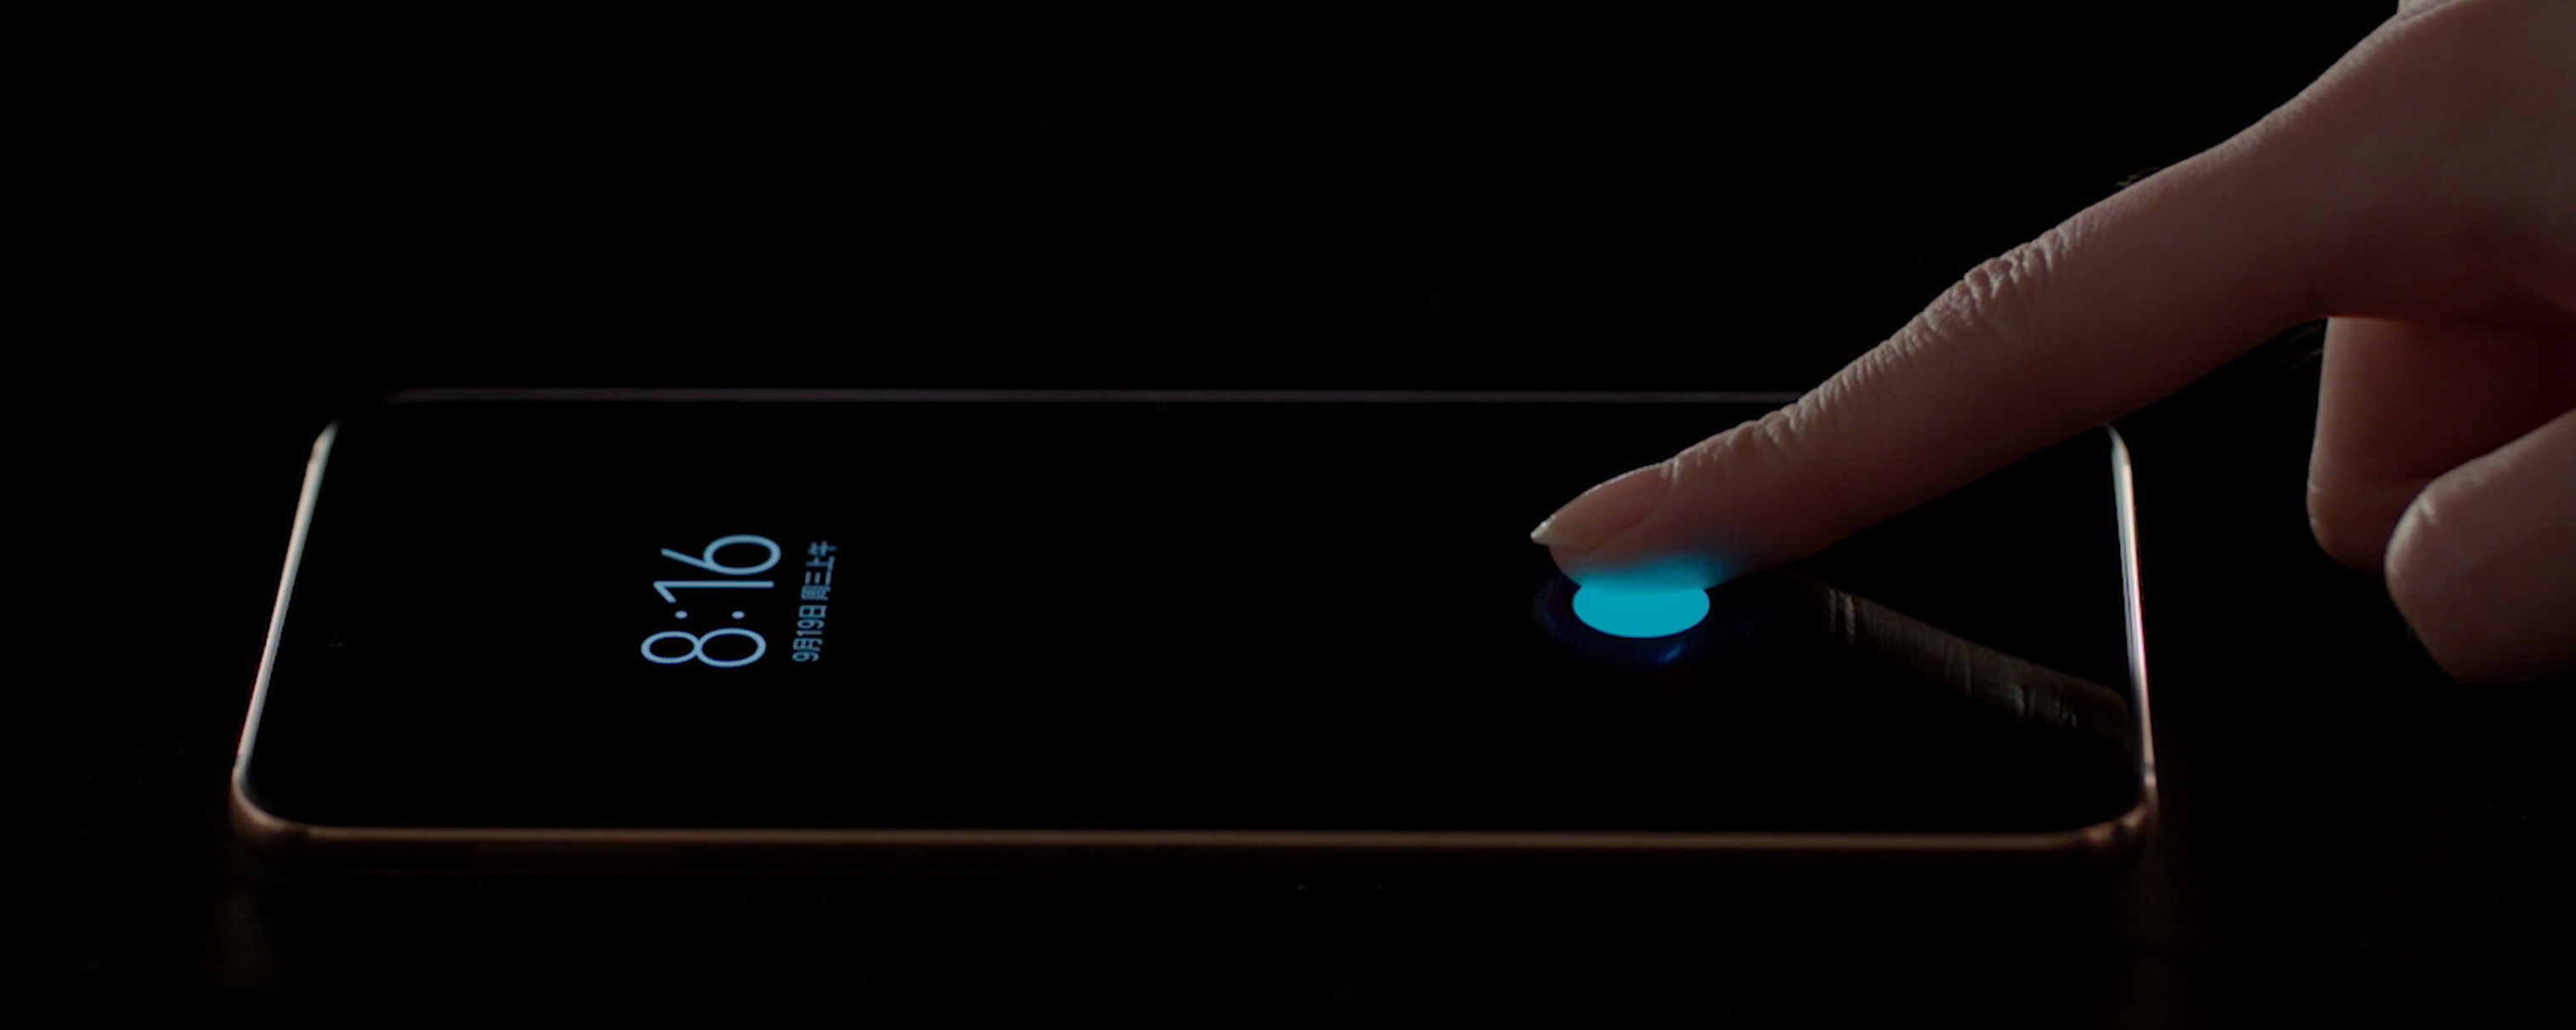 Xiaomi Mi 8 in display fingerprint